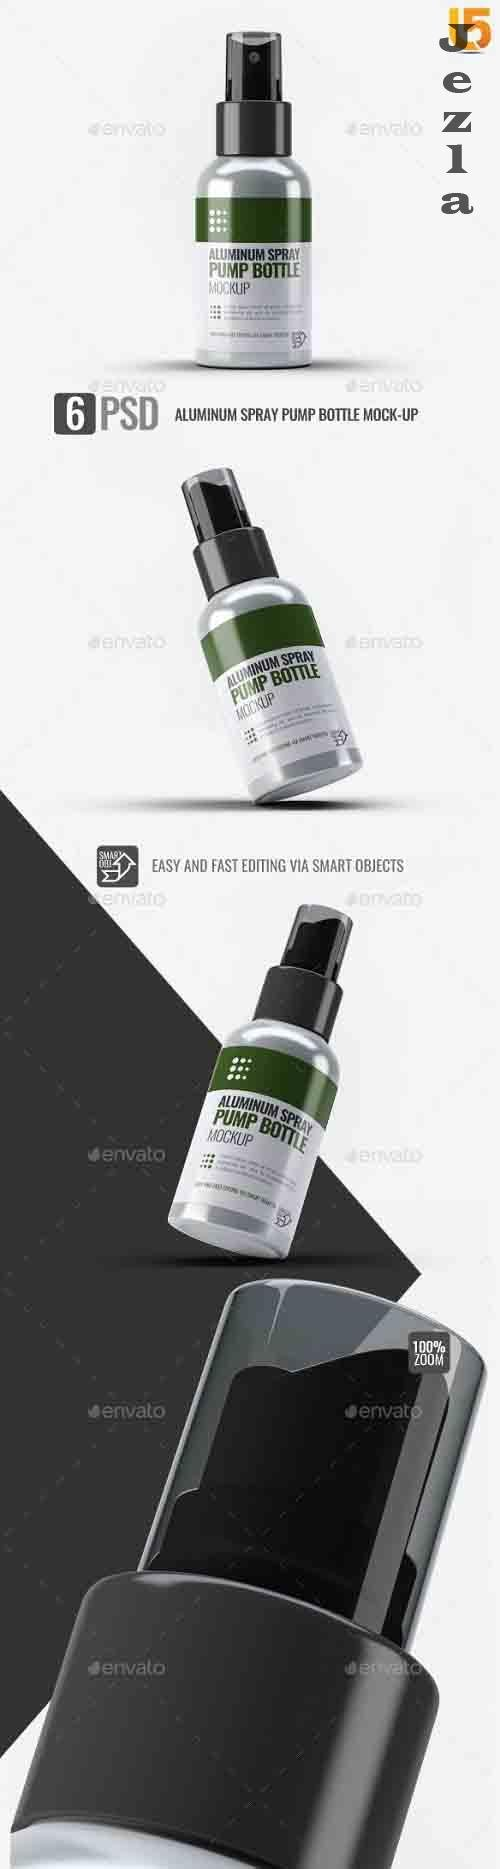 Aluminum Spray Pump Bottle Mock-Up - 31600352